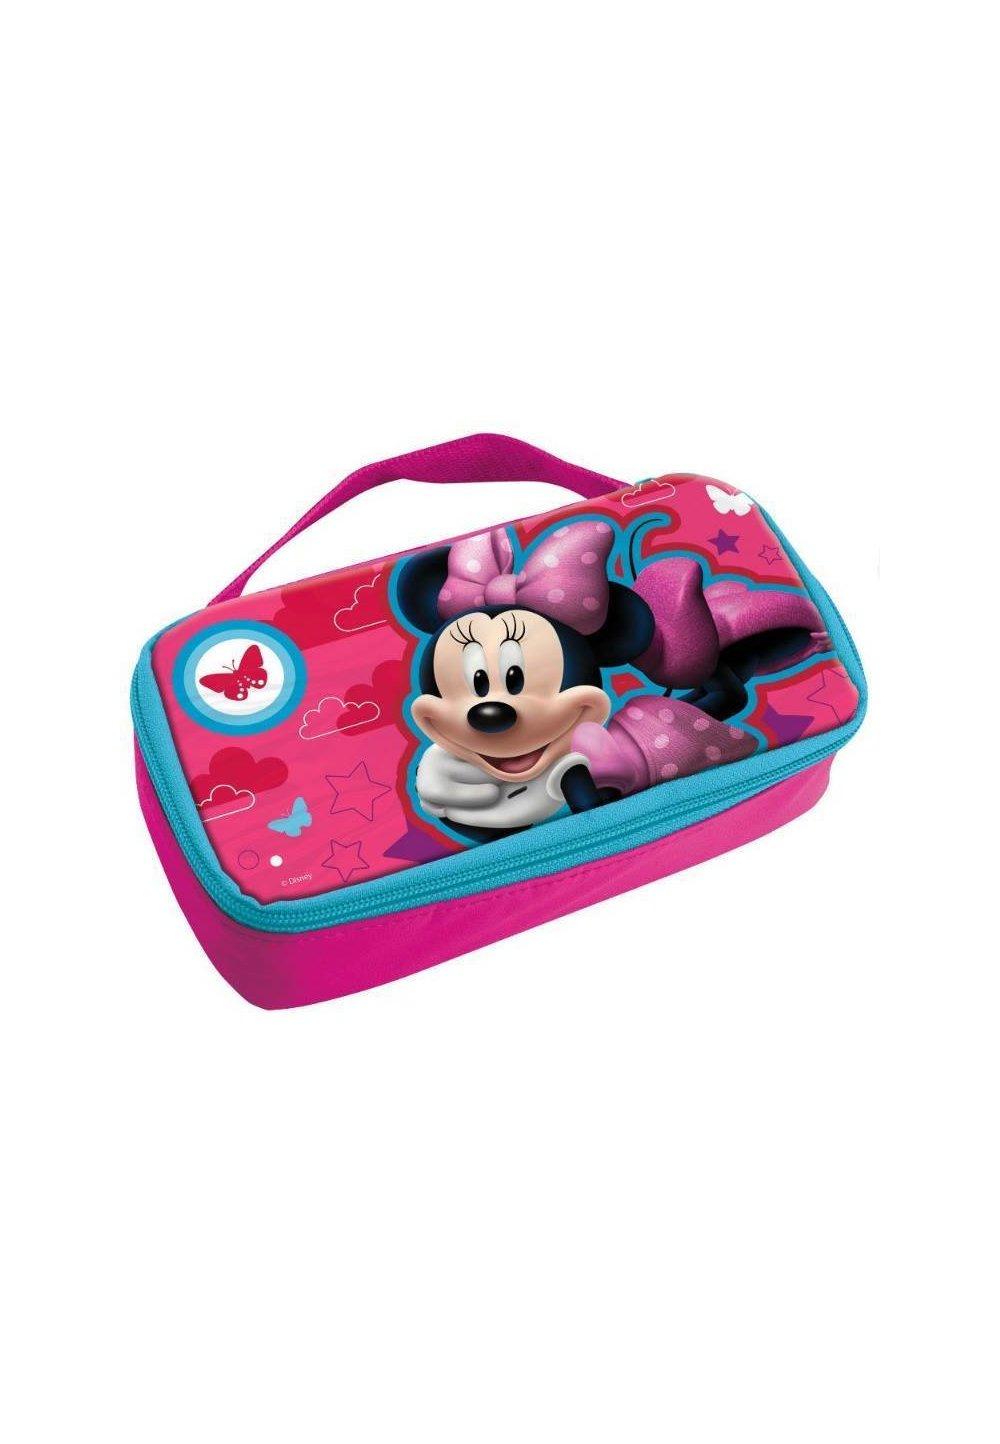 Geanta Termica Minnie Mouse, Roz